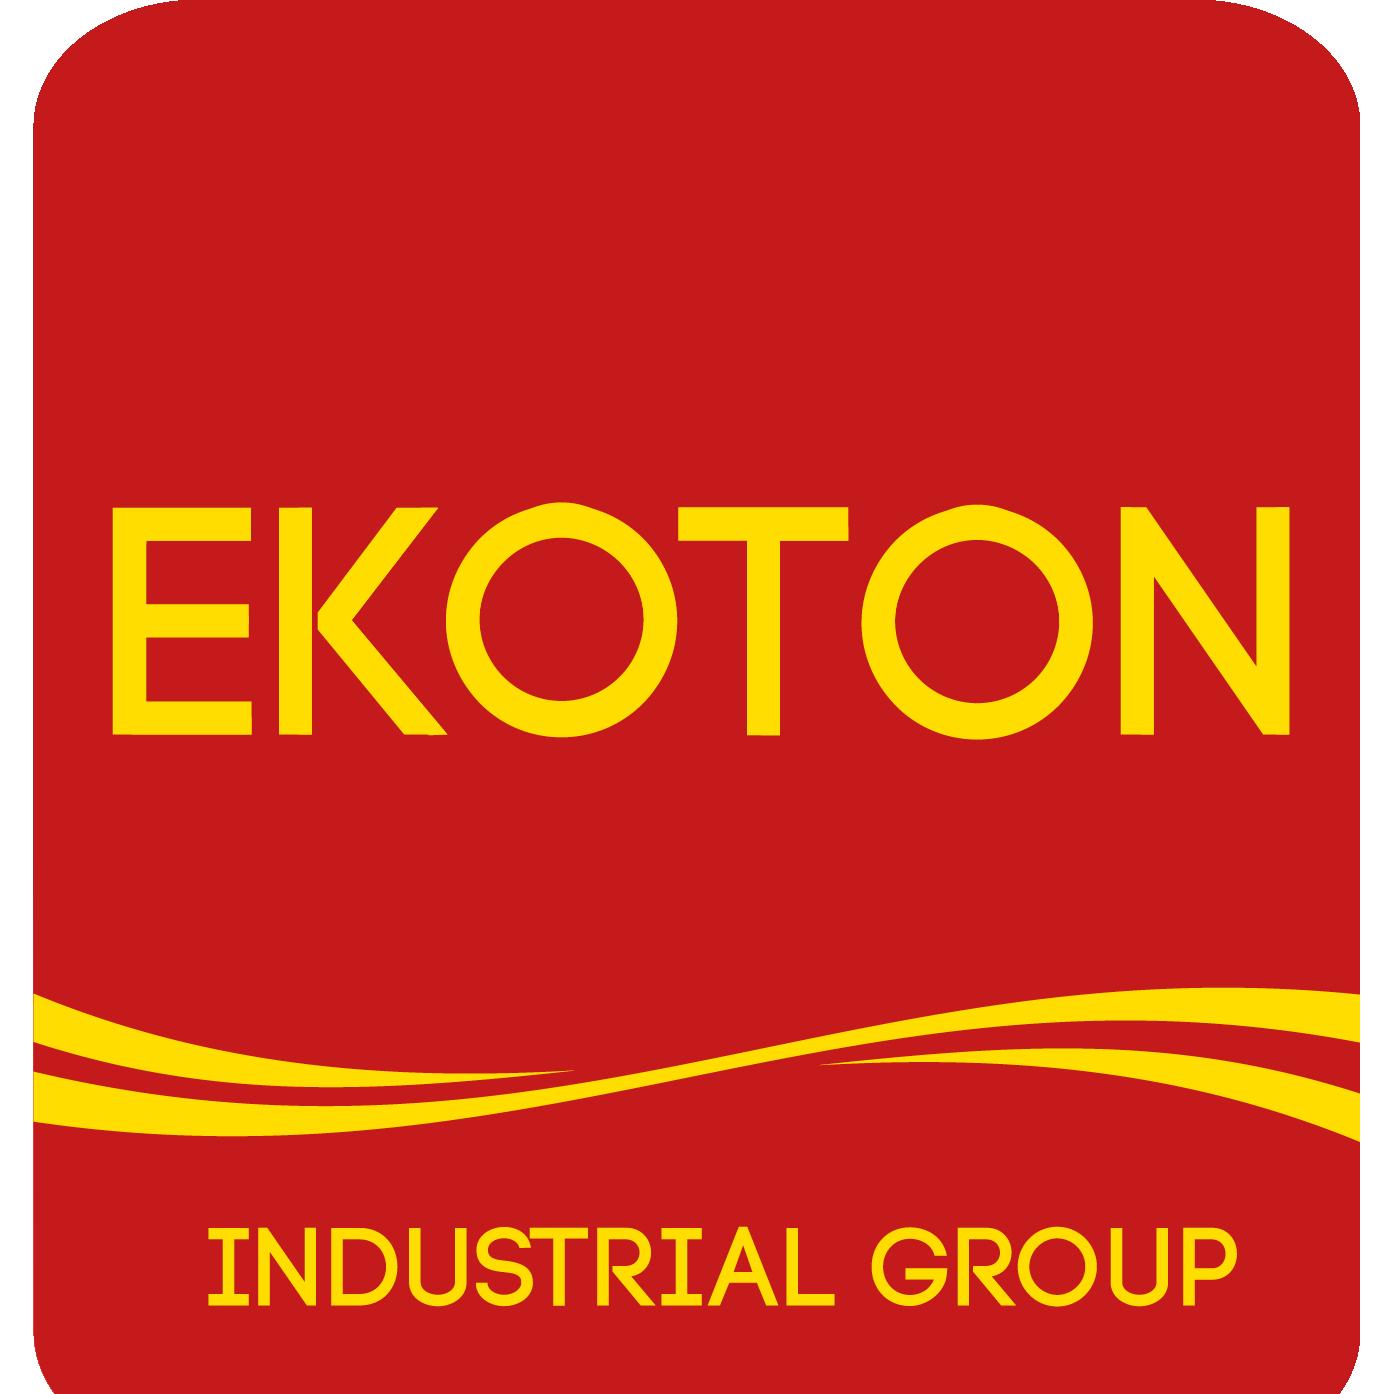 Company logo of EKOTON Industrial Group